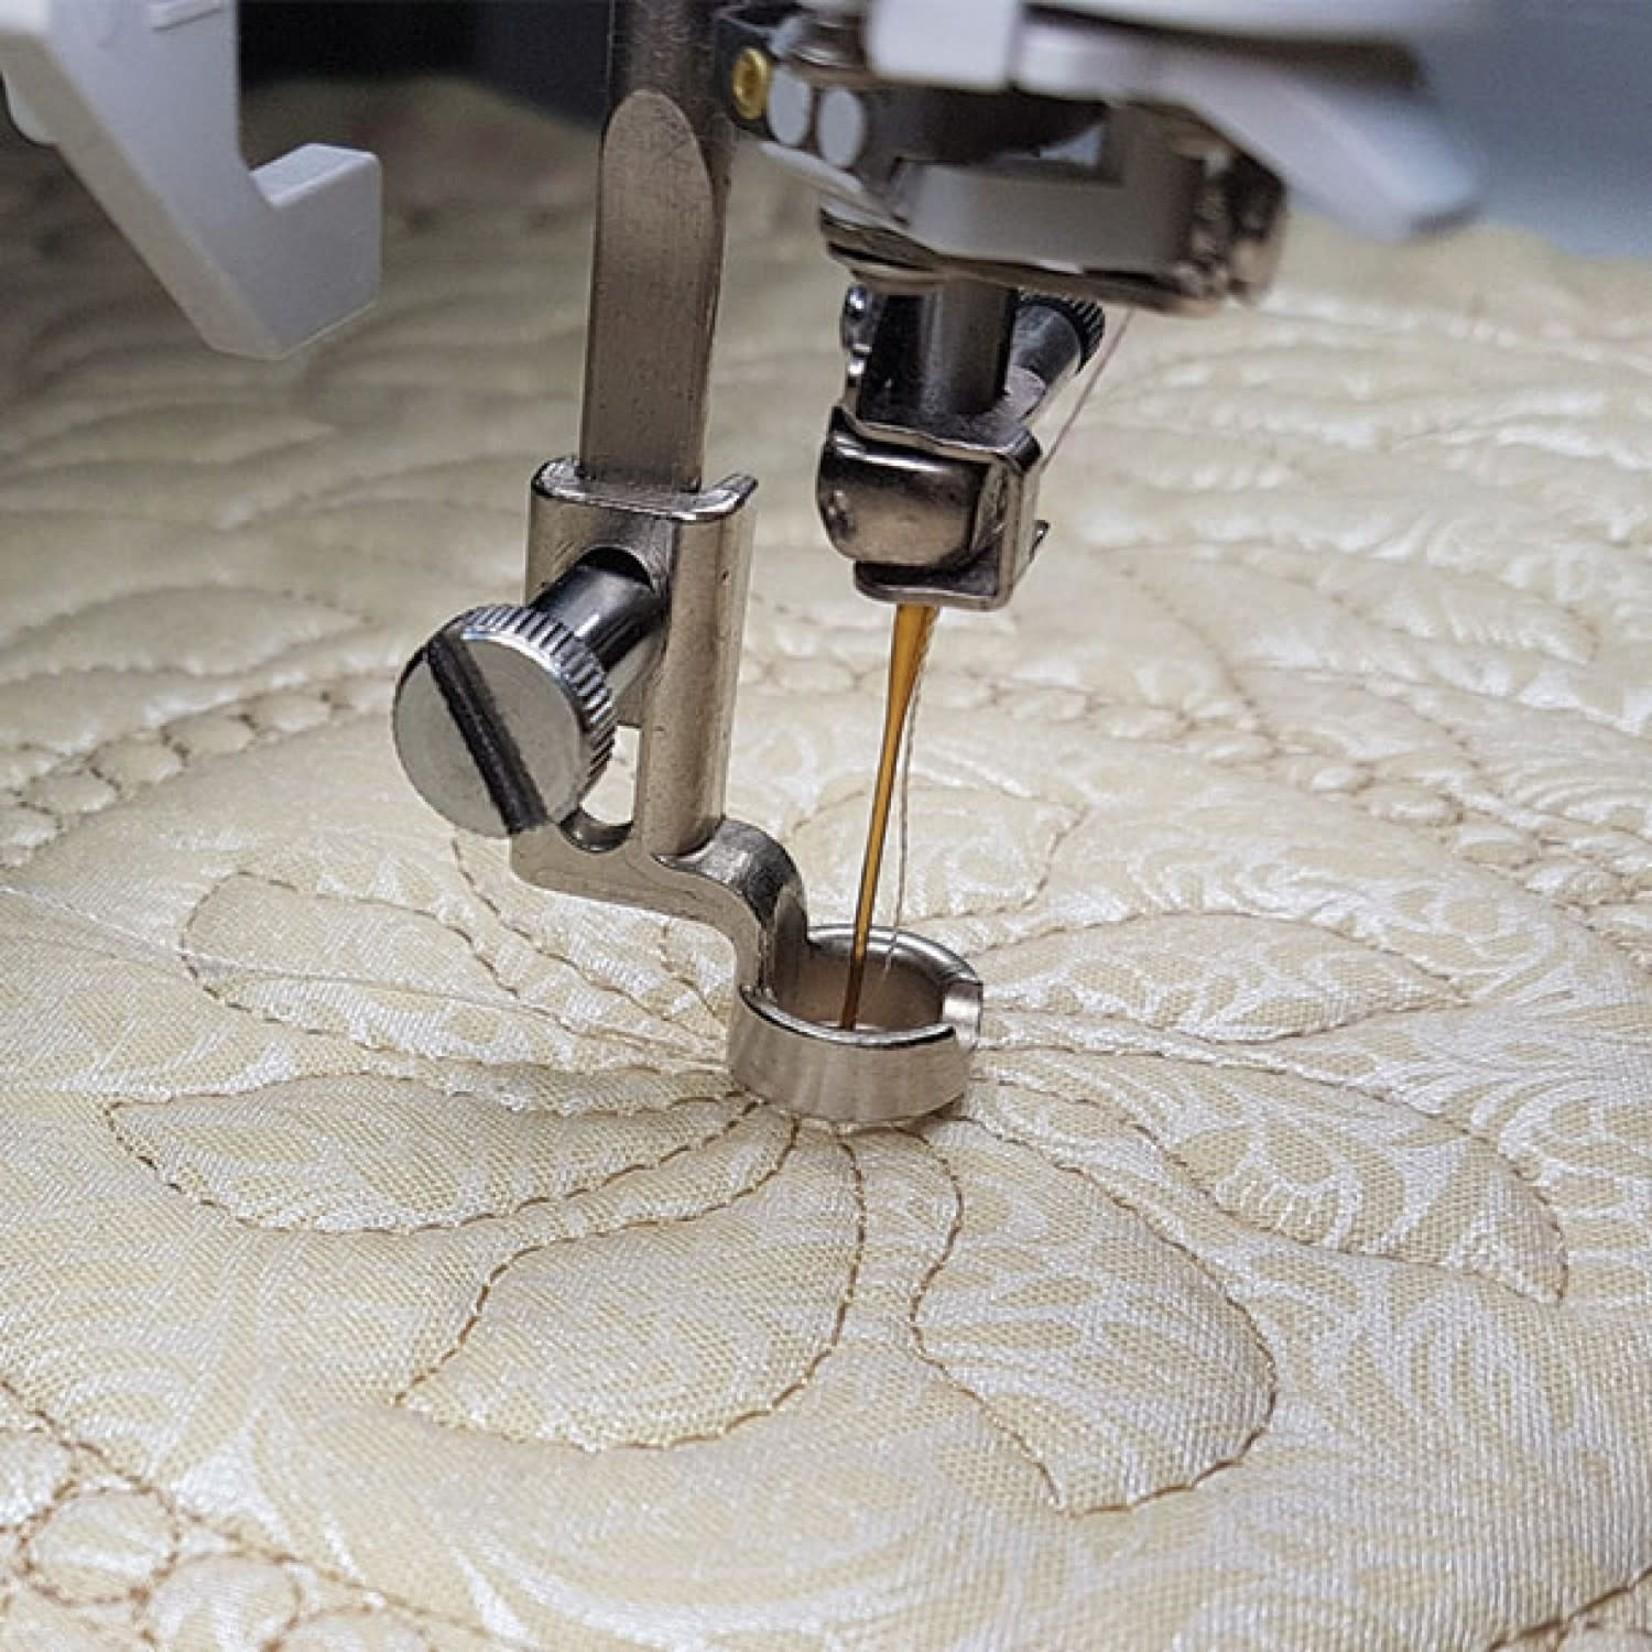 Sew Steady Ruler Foot - High Shank